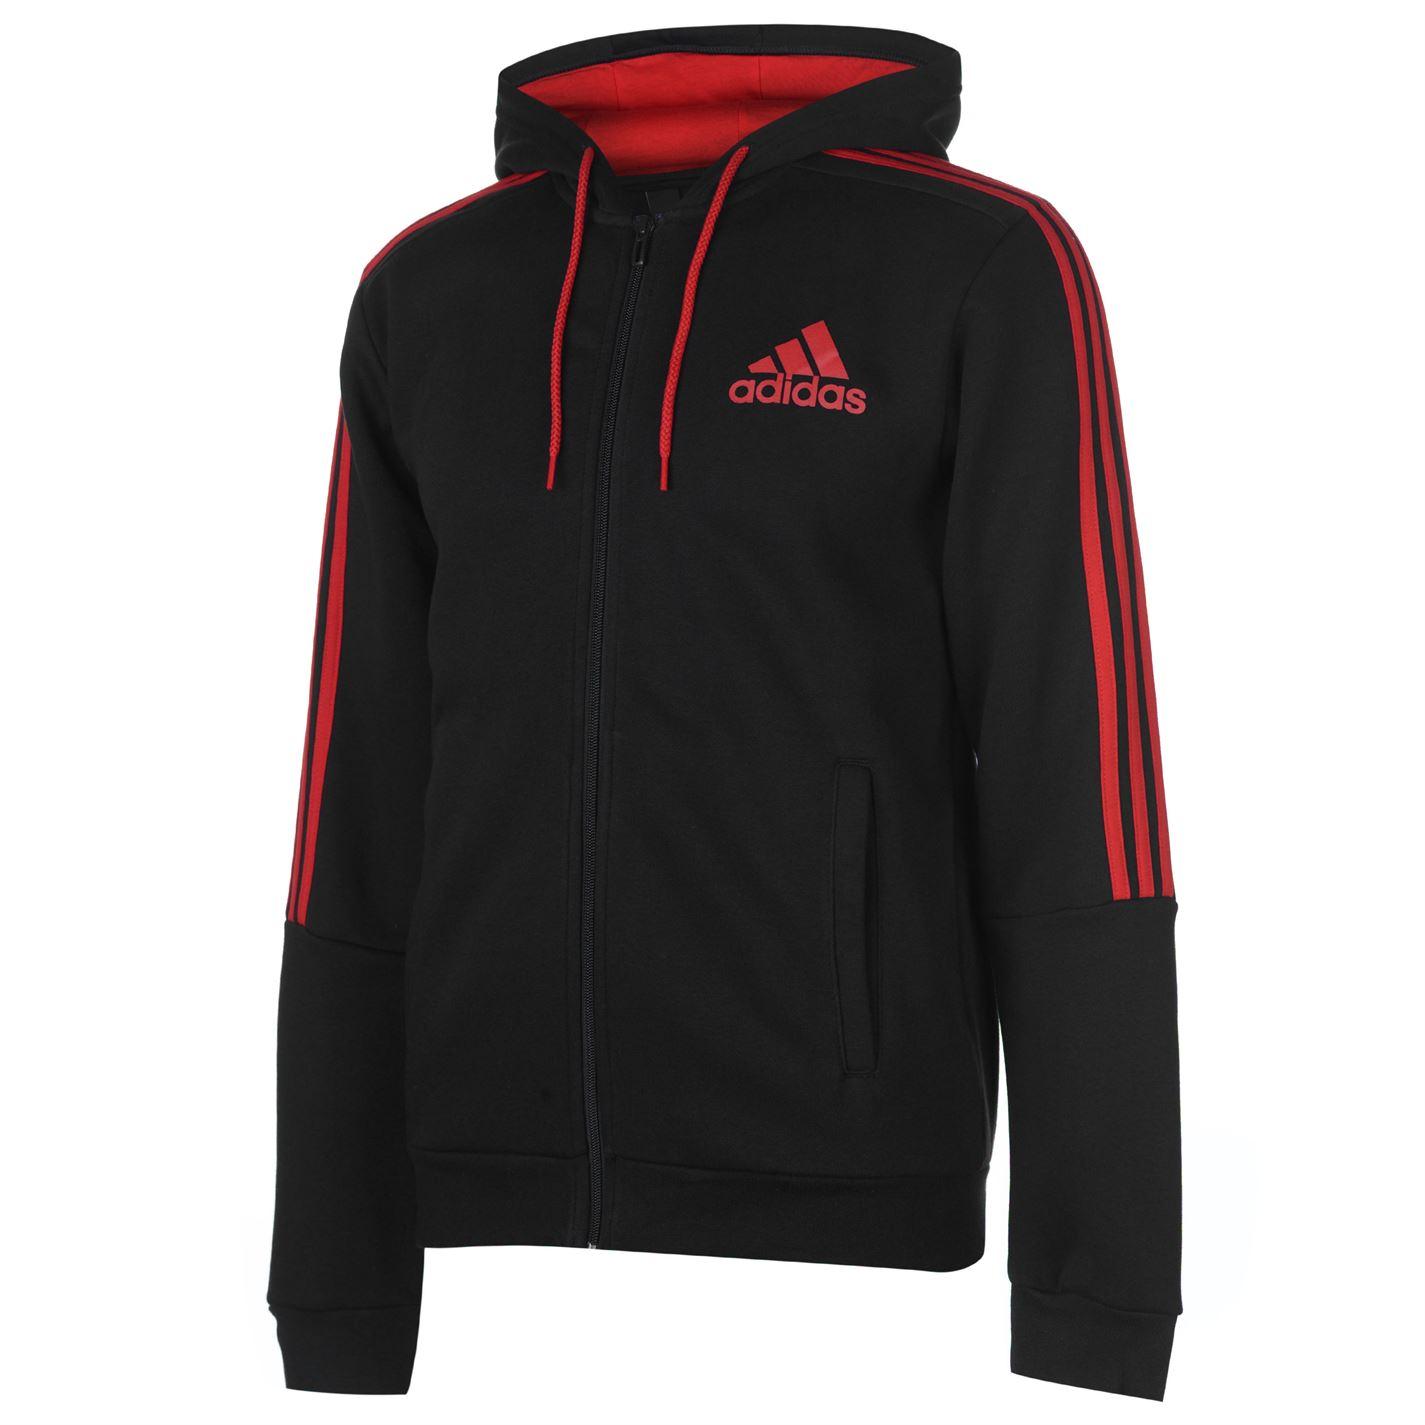 adidas 3 Stripes Zip Through pánská mikina Black Red - Glami.cz 6997fe6e764